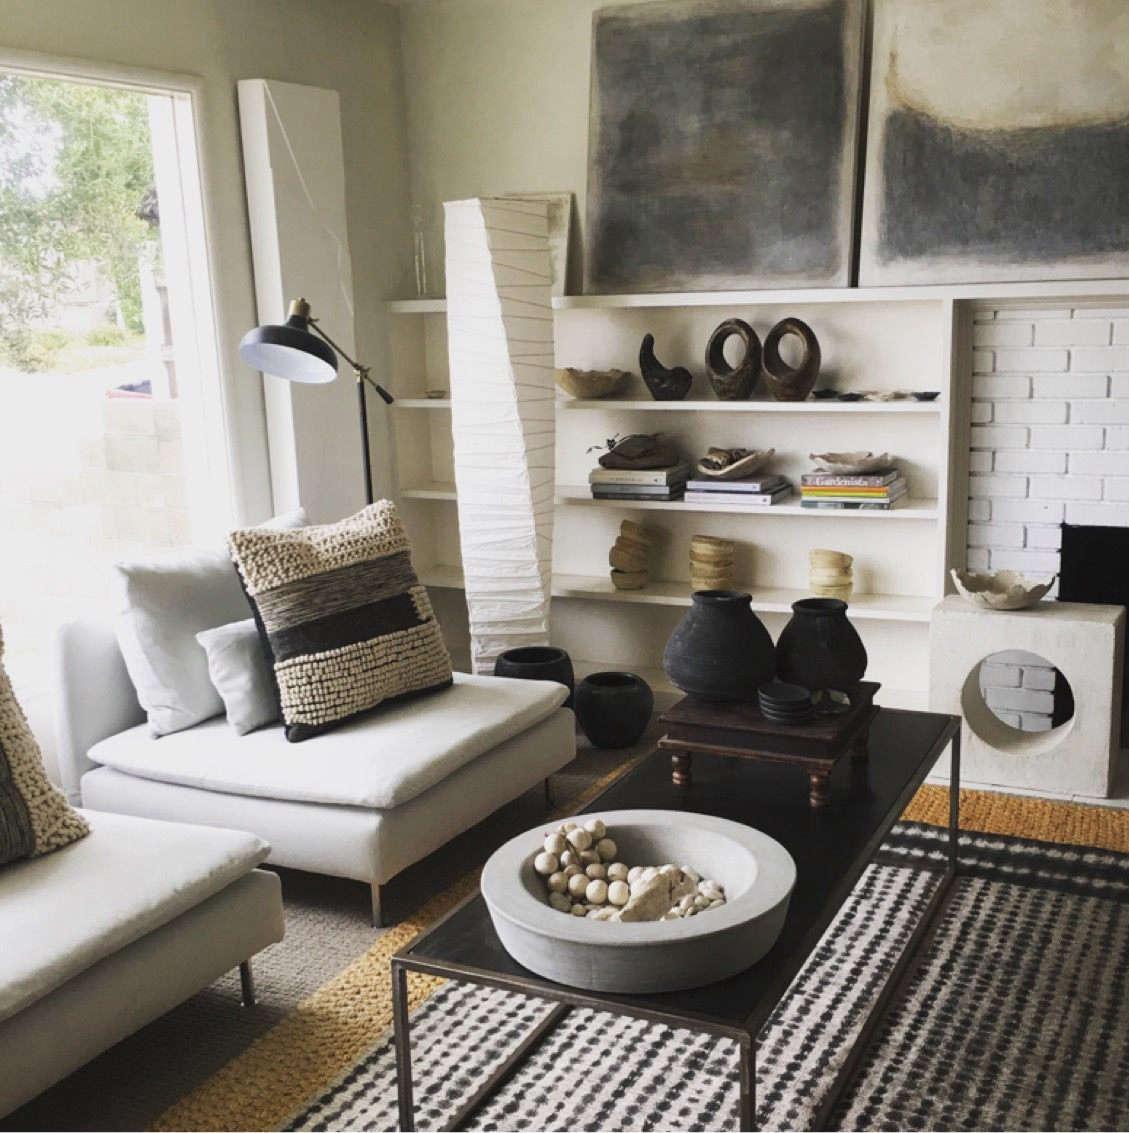 the best living room design 54 Images On Lorraine Pennington entered